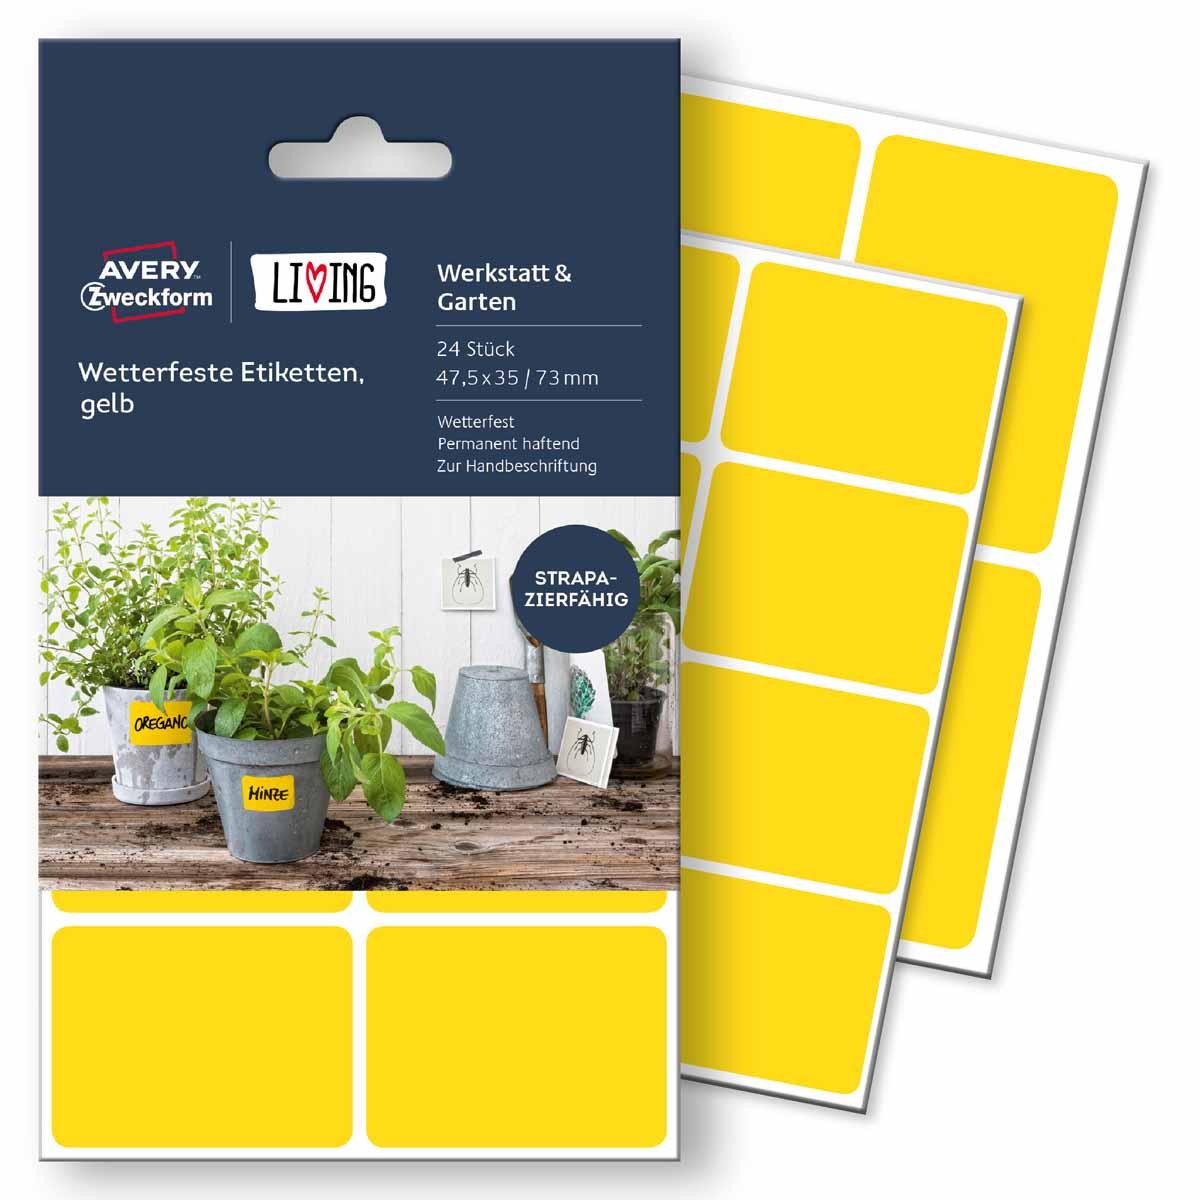 Avery Zweckform Этикетки для дома Living 47,5 х 35 мм цвет желтый avery zweckform этикетки самоклеящиеся европа 100 52 5 х 29 7 мм 18 листов